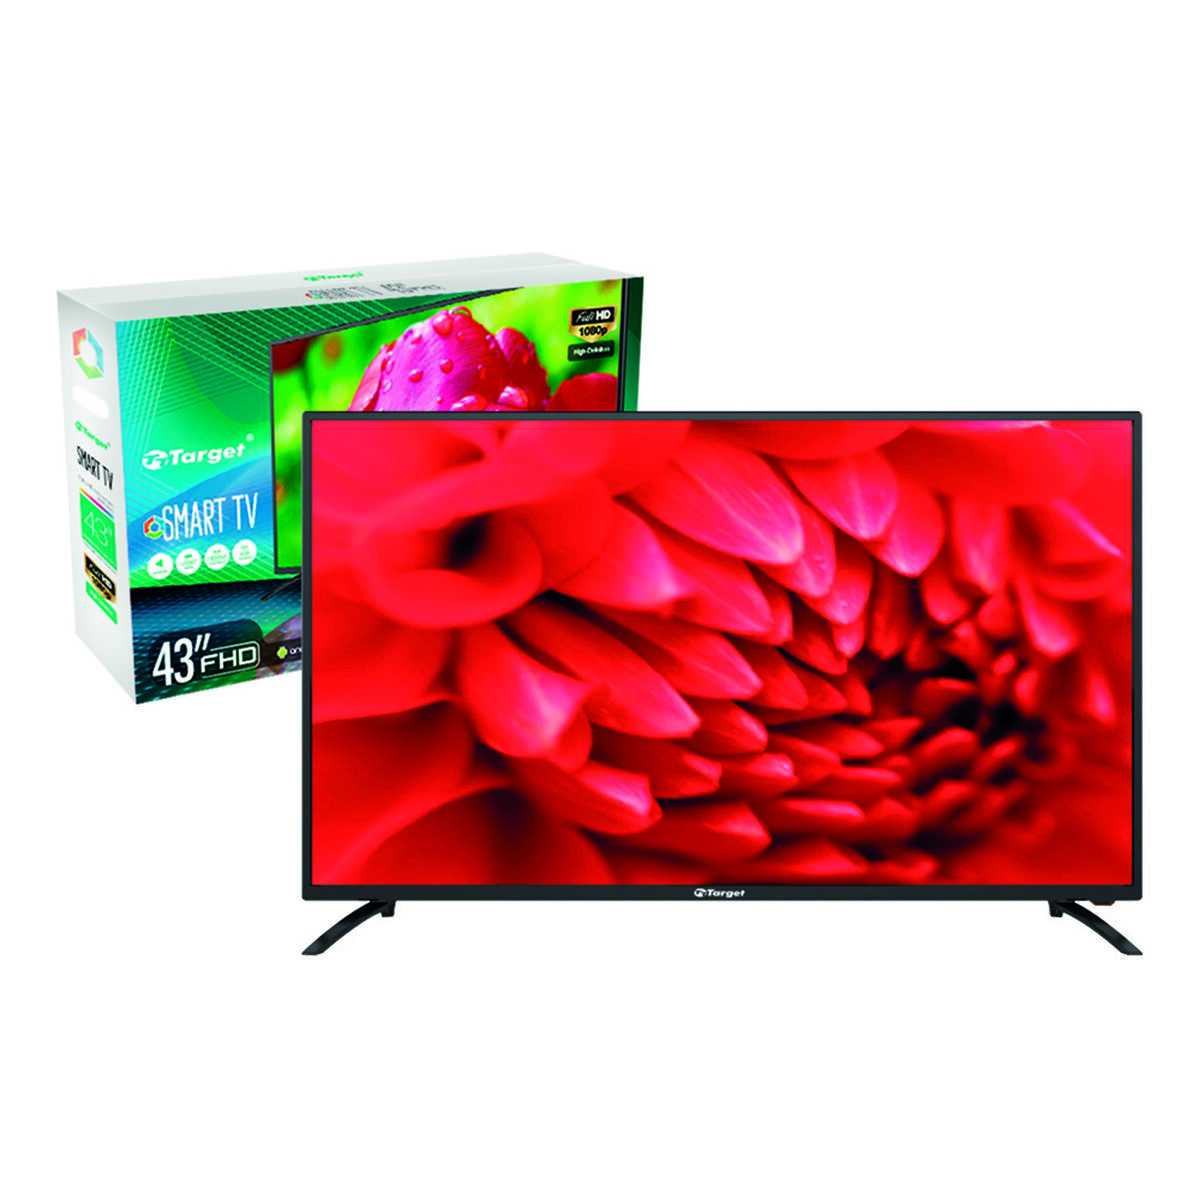 "DLED 43"" Target LE-4319N Smart TV Full HD"